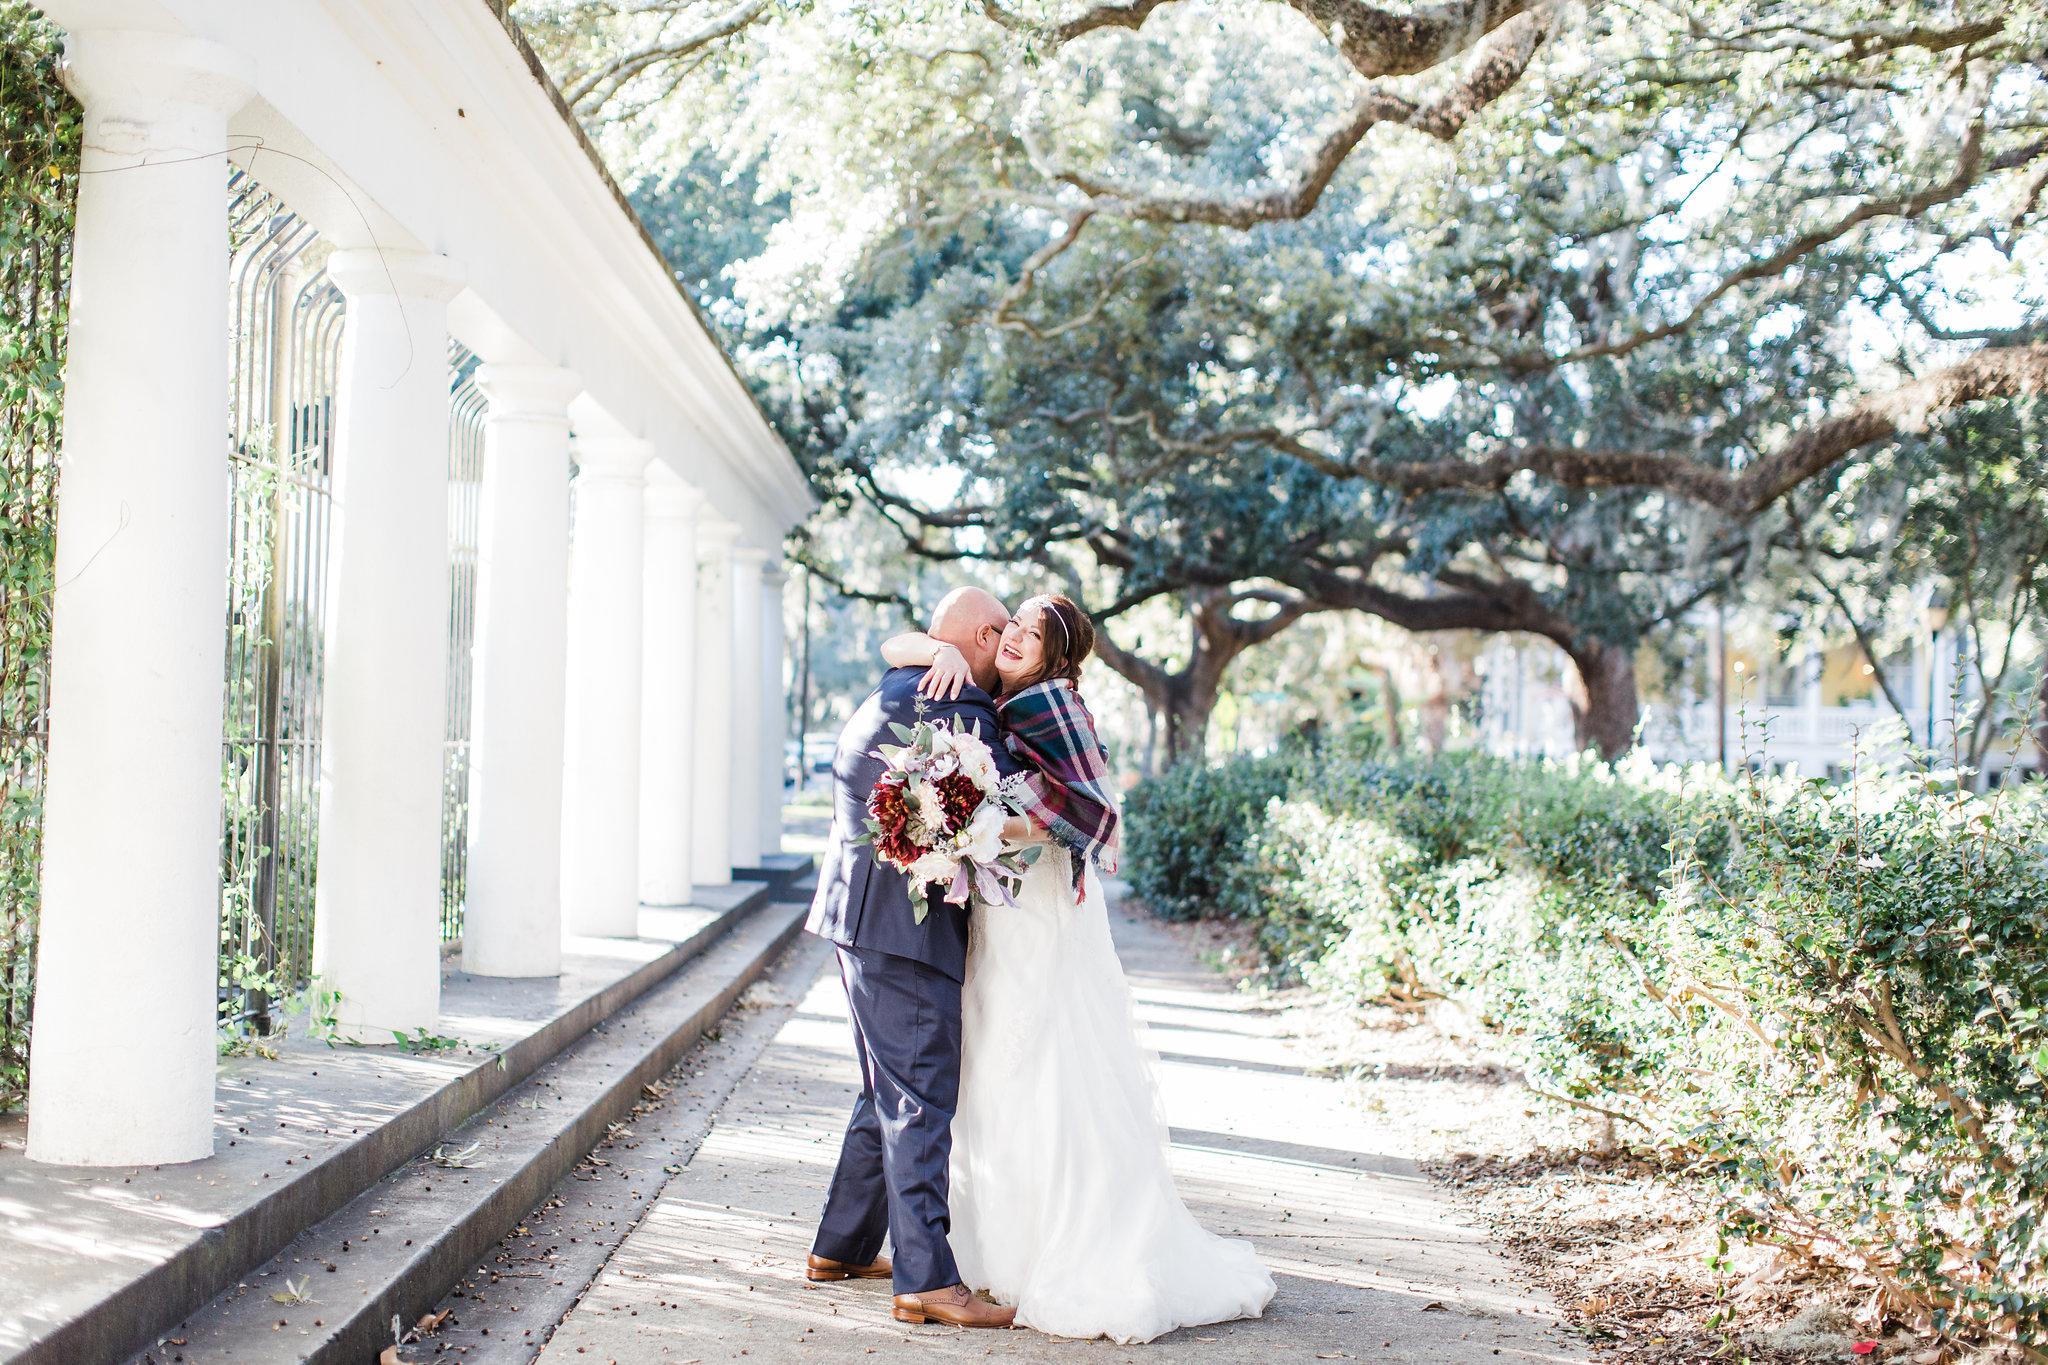 apt-b-photography-kristy-rob-wormsloe-elopment-savannah-wedding-photographer-savannah-elopement-wormsloe-wedding-historic-savannah-elopement-photographer-savannah-fall-wedding-35.jpg